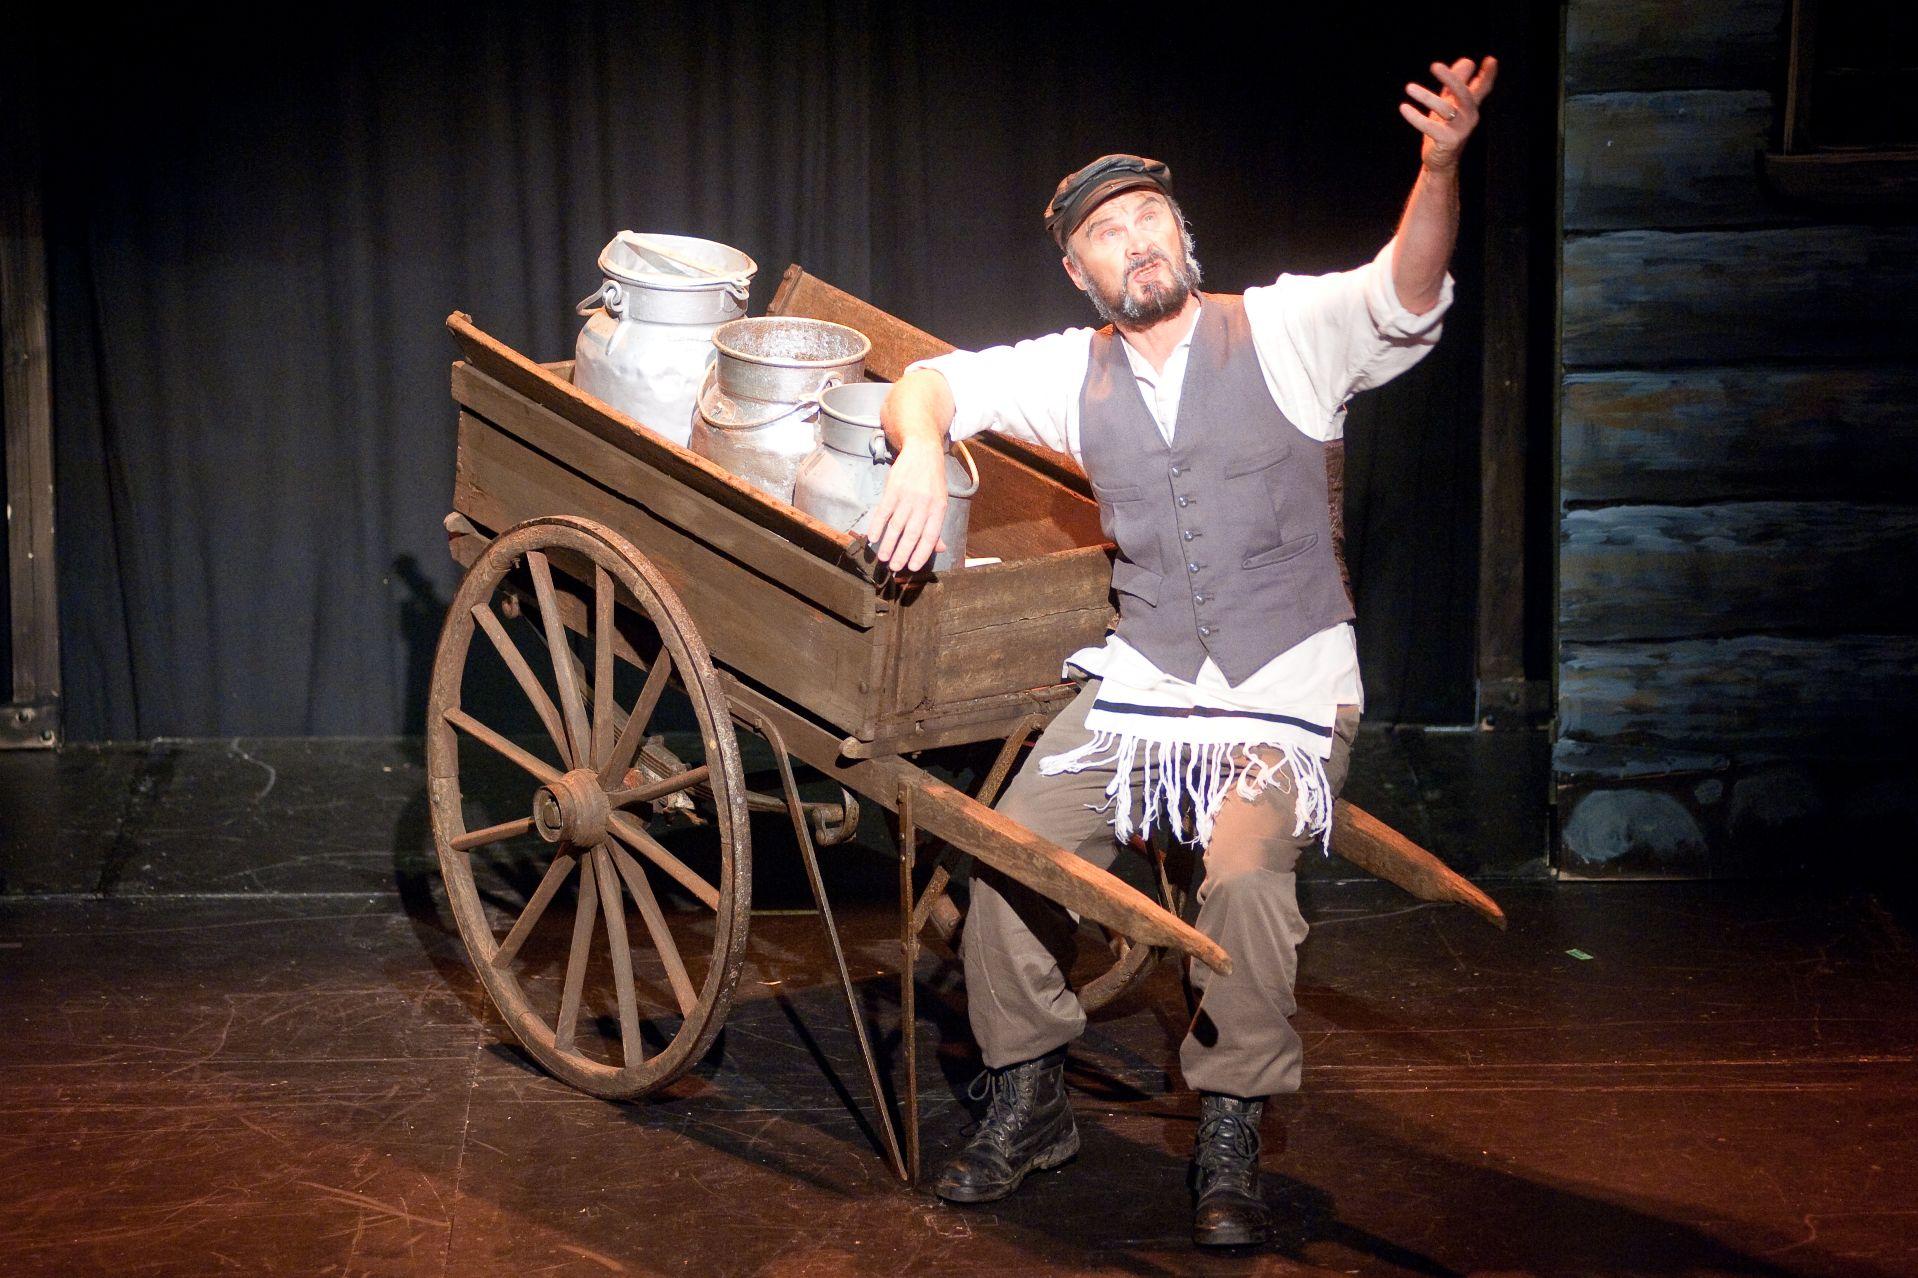 Fiddler On The Roof 2013 Musical Theatre Gisborne